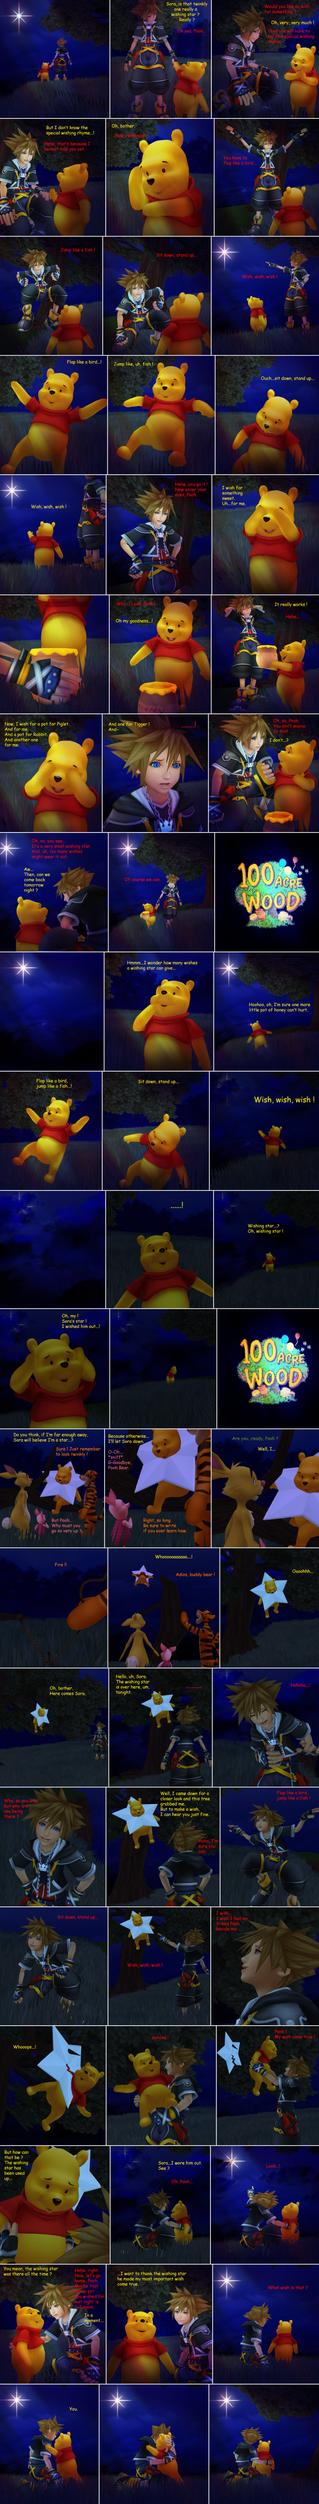 The Wishing Bear by SorasPrincesss